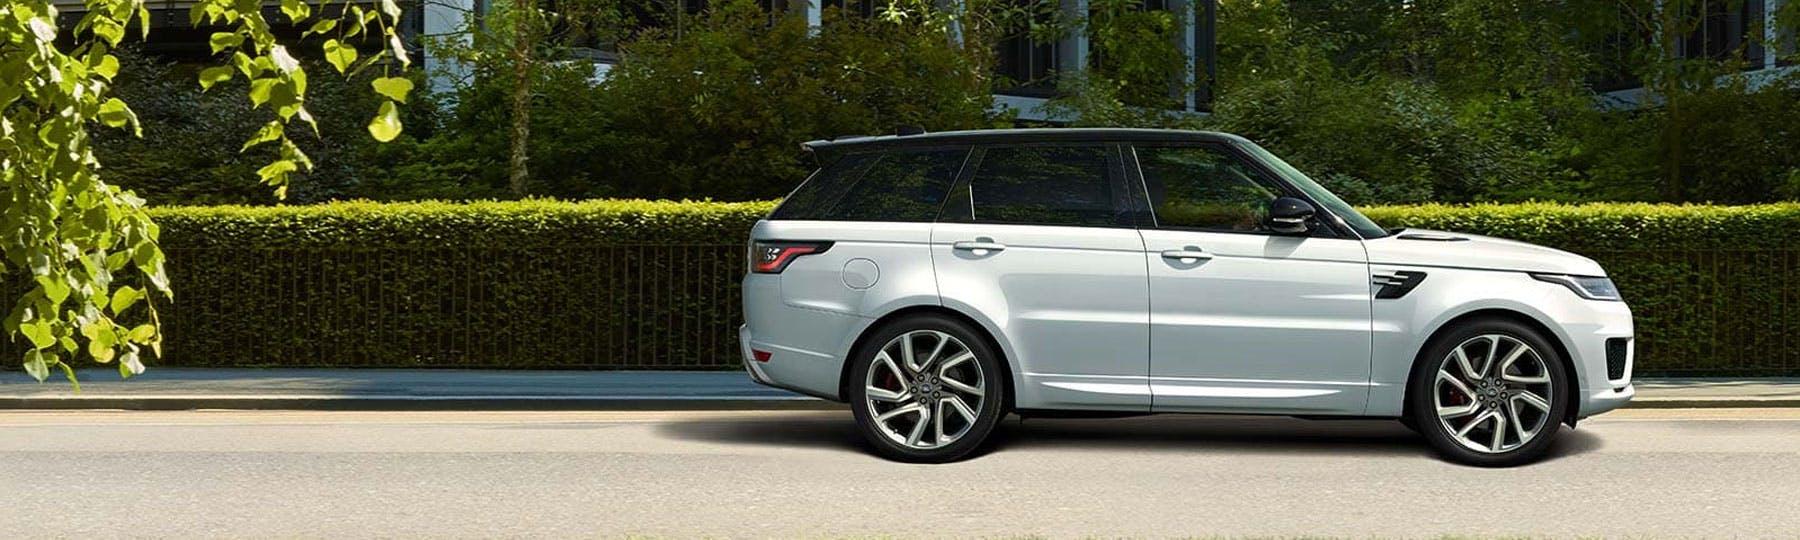 Land Rover Range Rover Sport PHEV